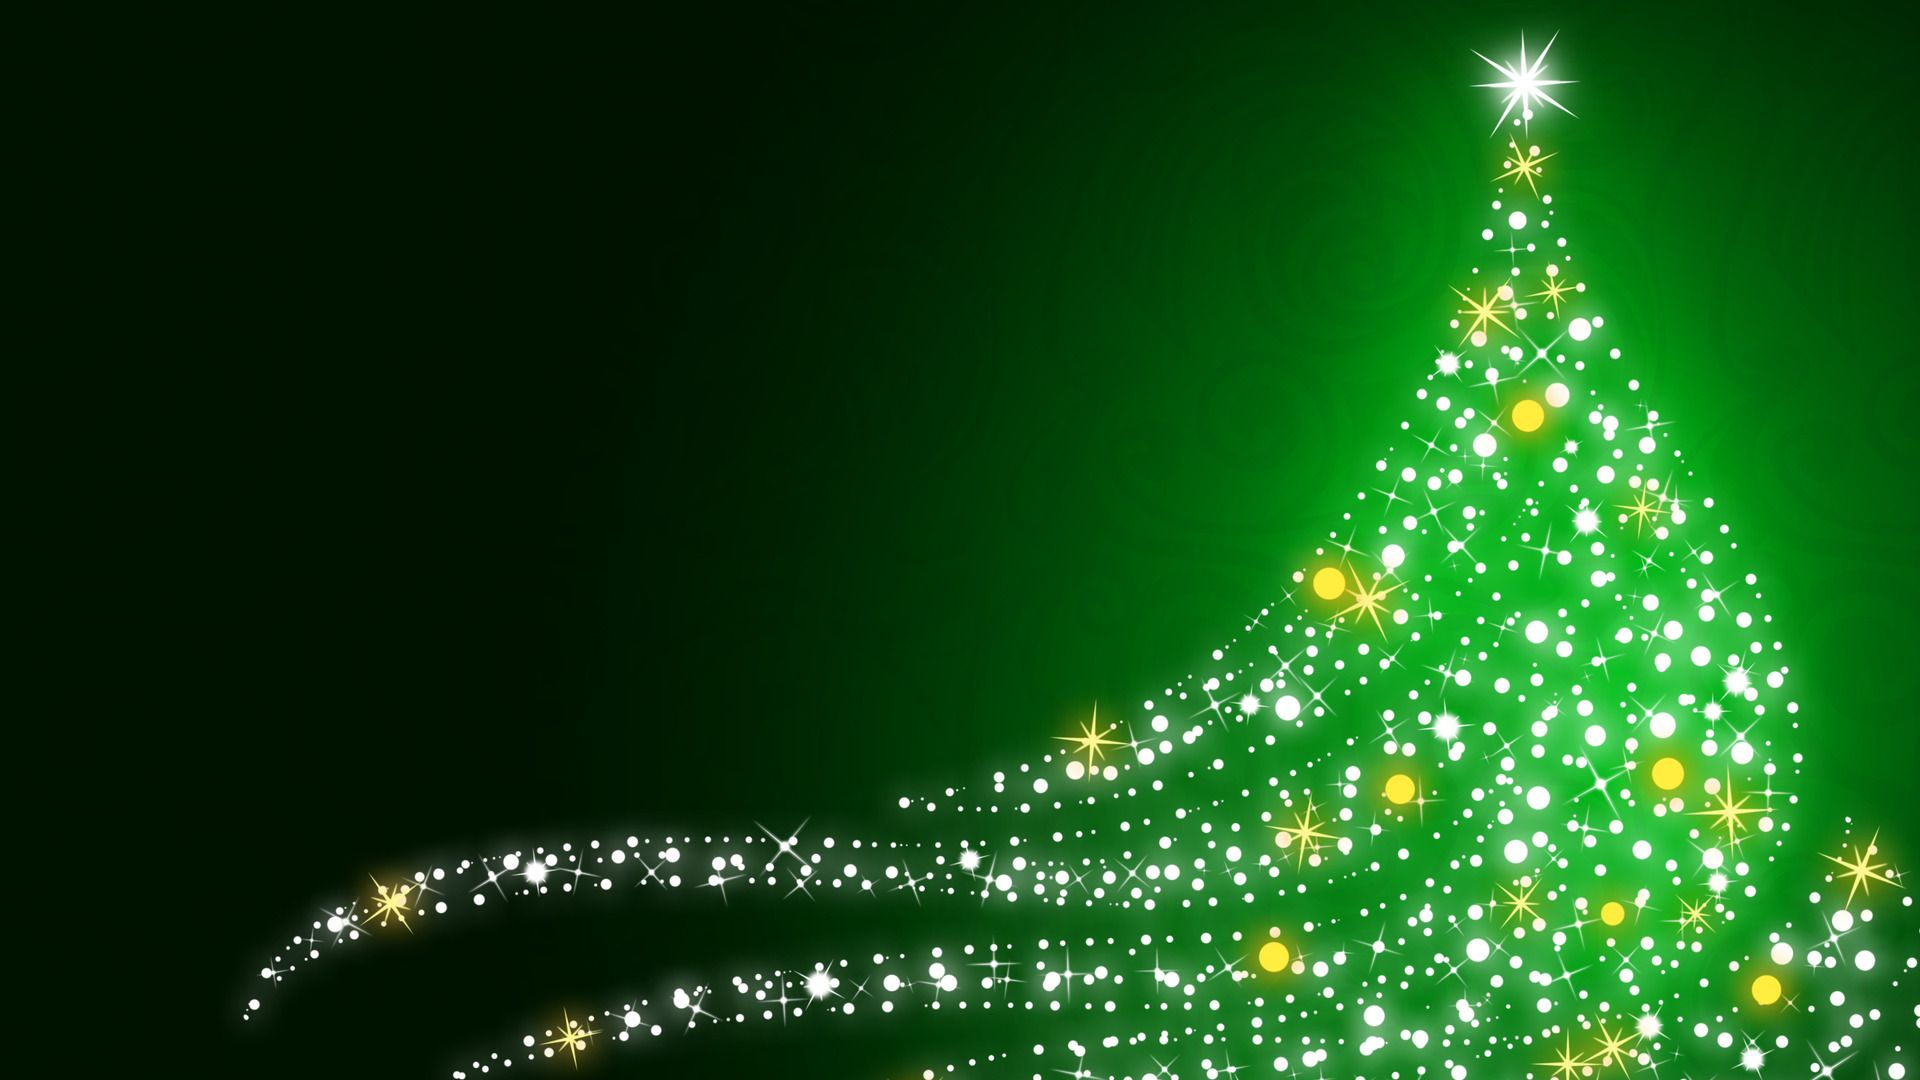 Sparkling Christmas Tree Hdpicorner Christmas Images Wallpaper Christmas Wallpaper Hd Christmas Desktop Wallpaper